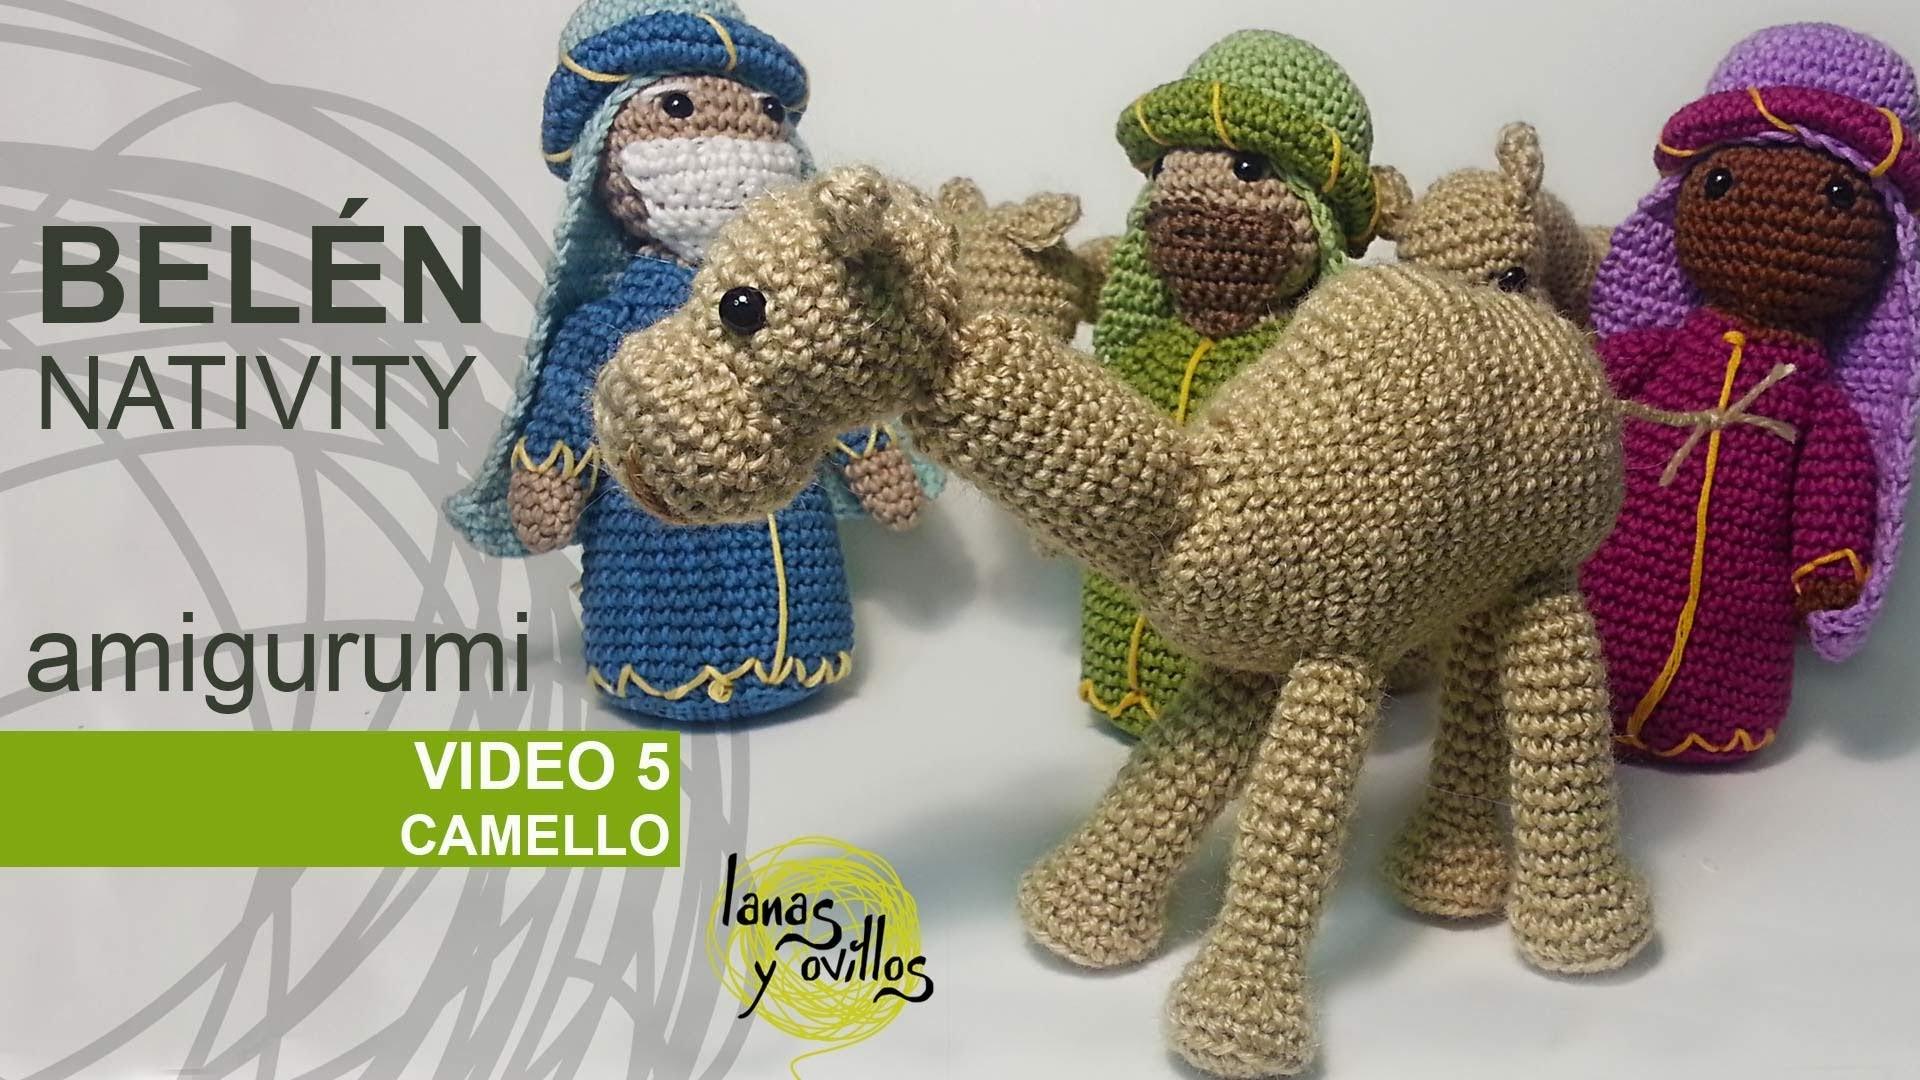 Tutorial Belén Amigurumi Part 5: Camellos (Nativity English subtitles)